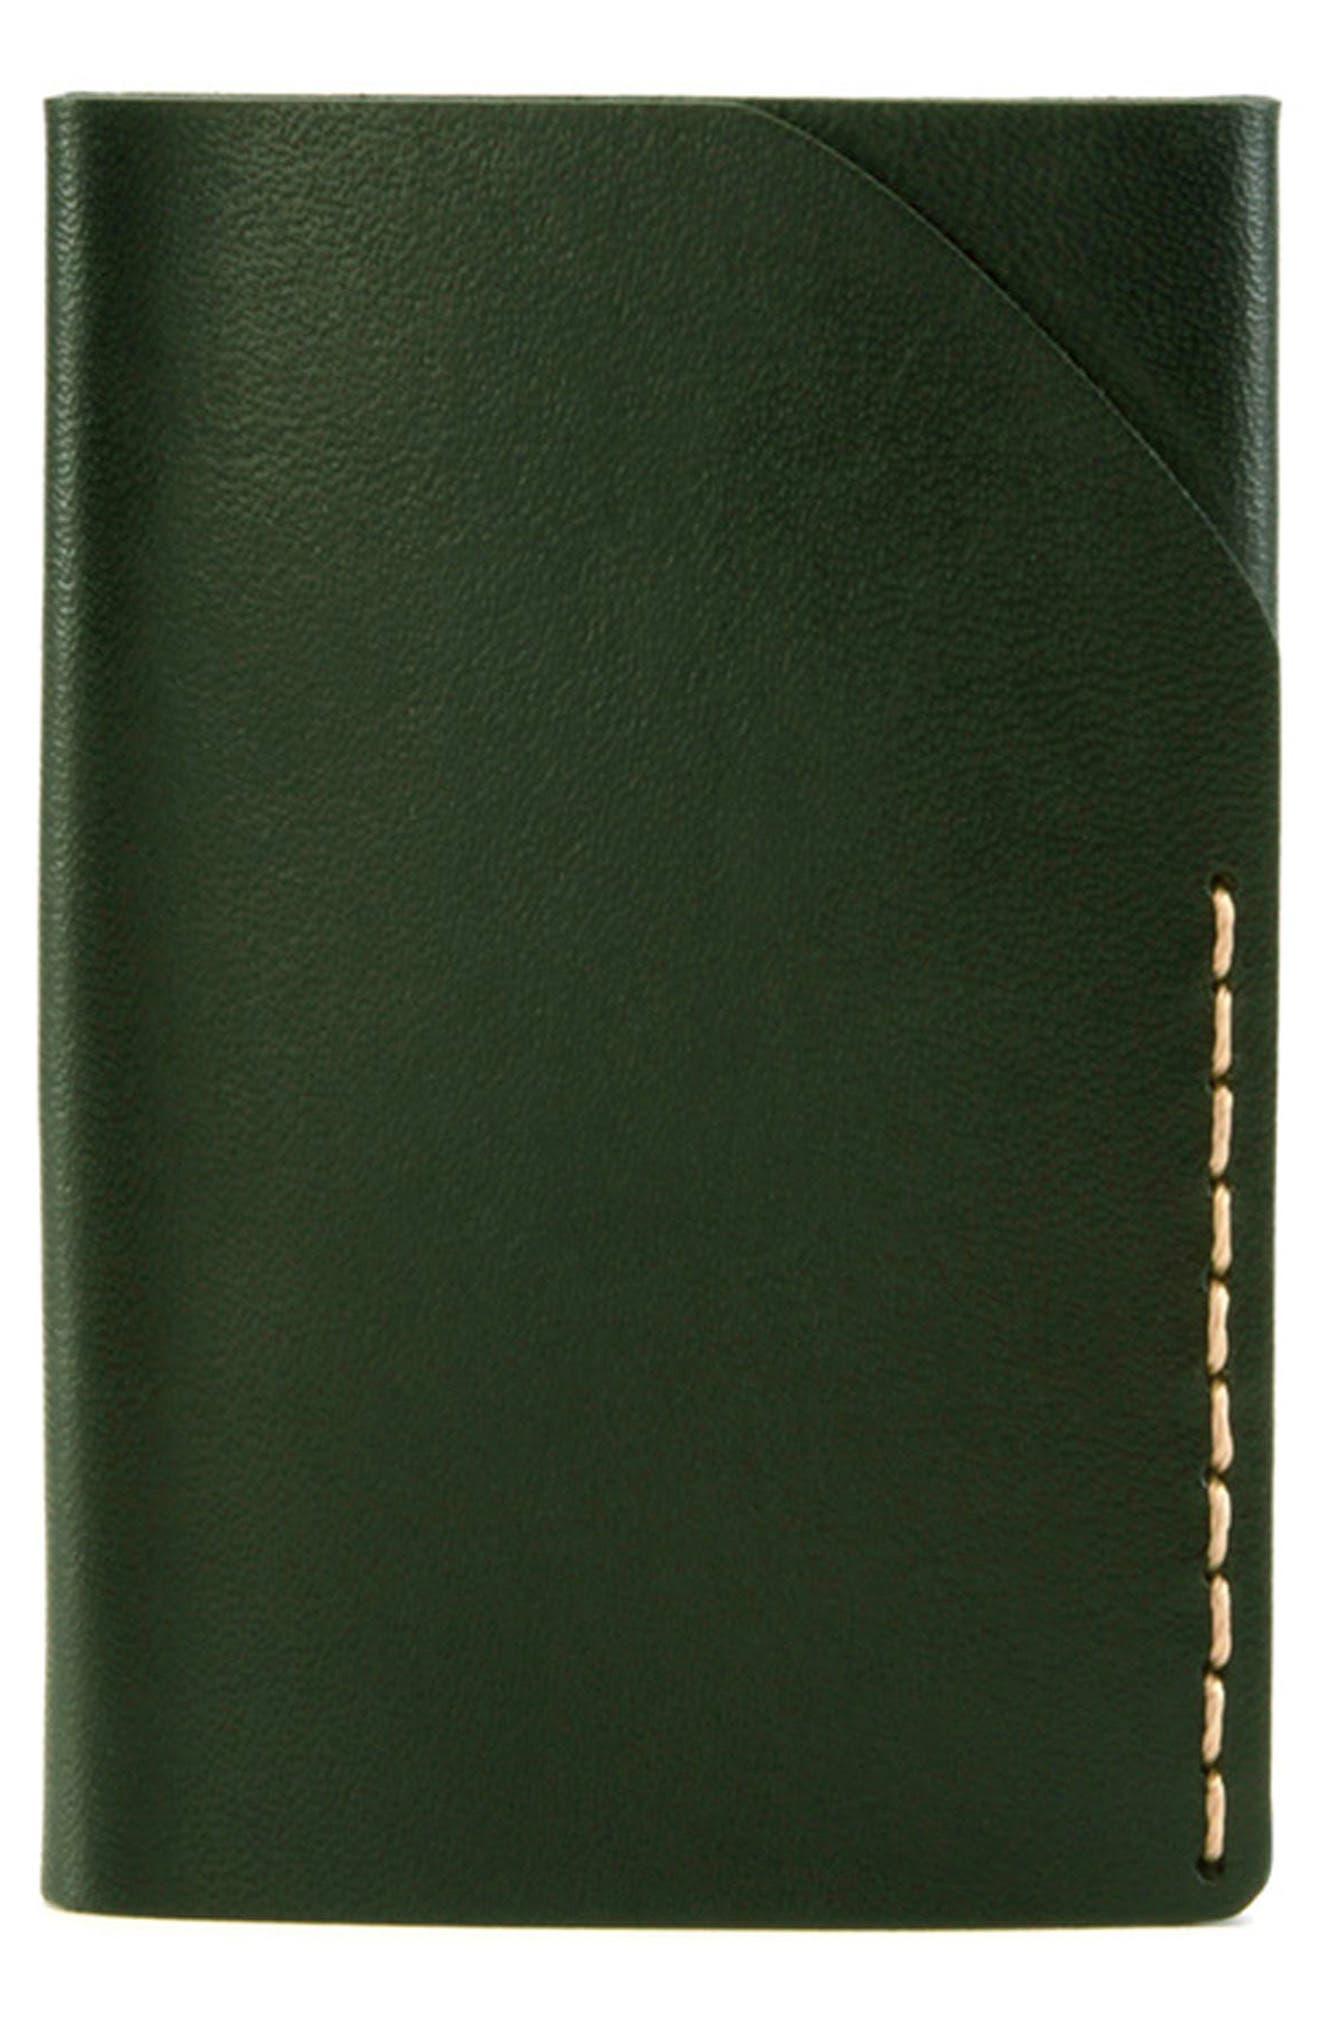 Ezra Arthur No. 2 Leather Card Case